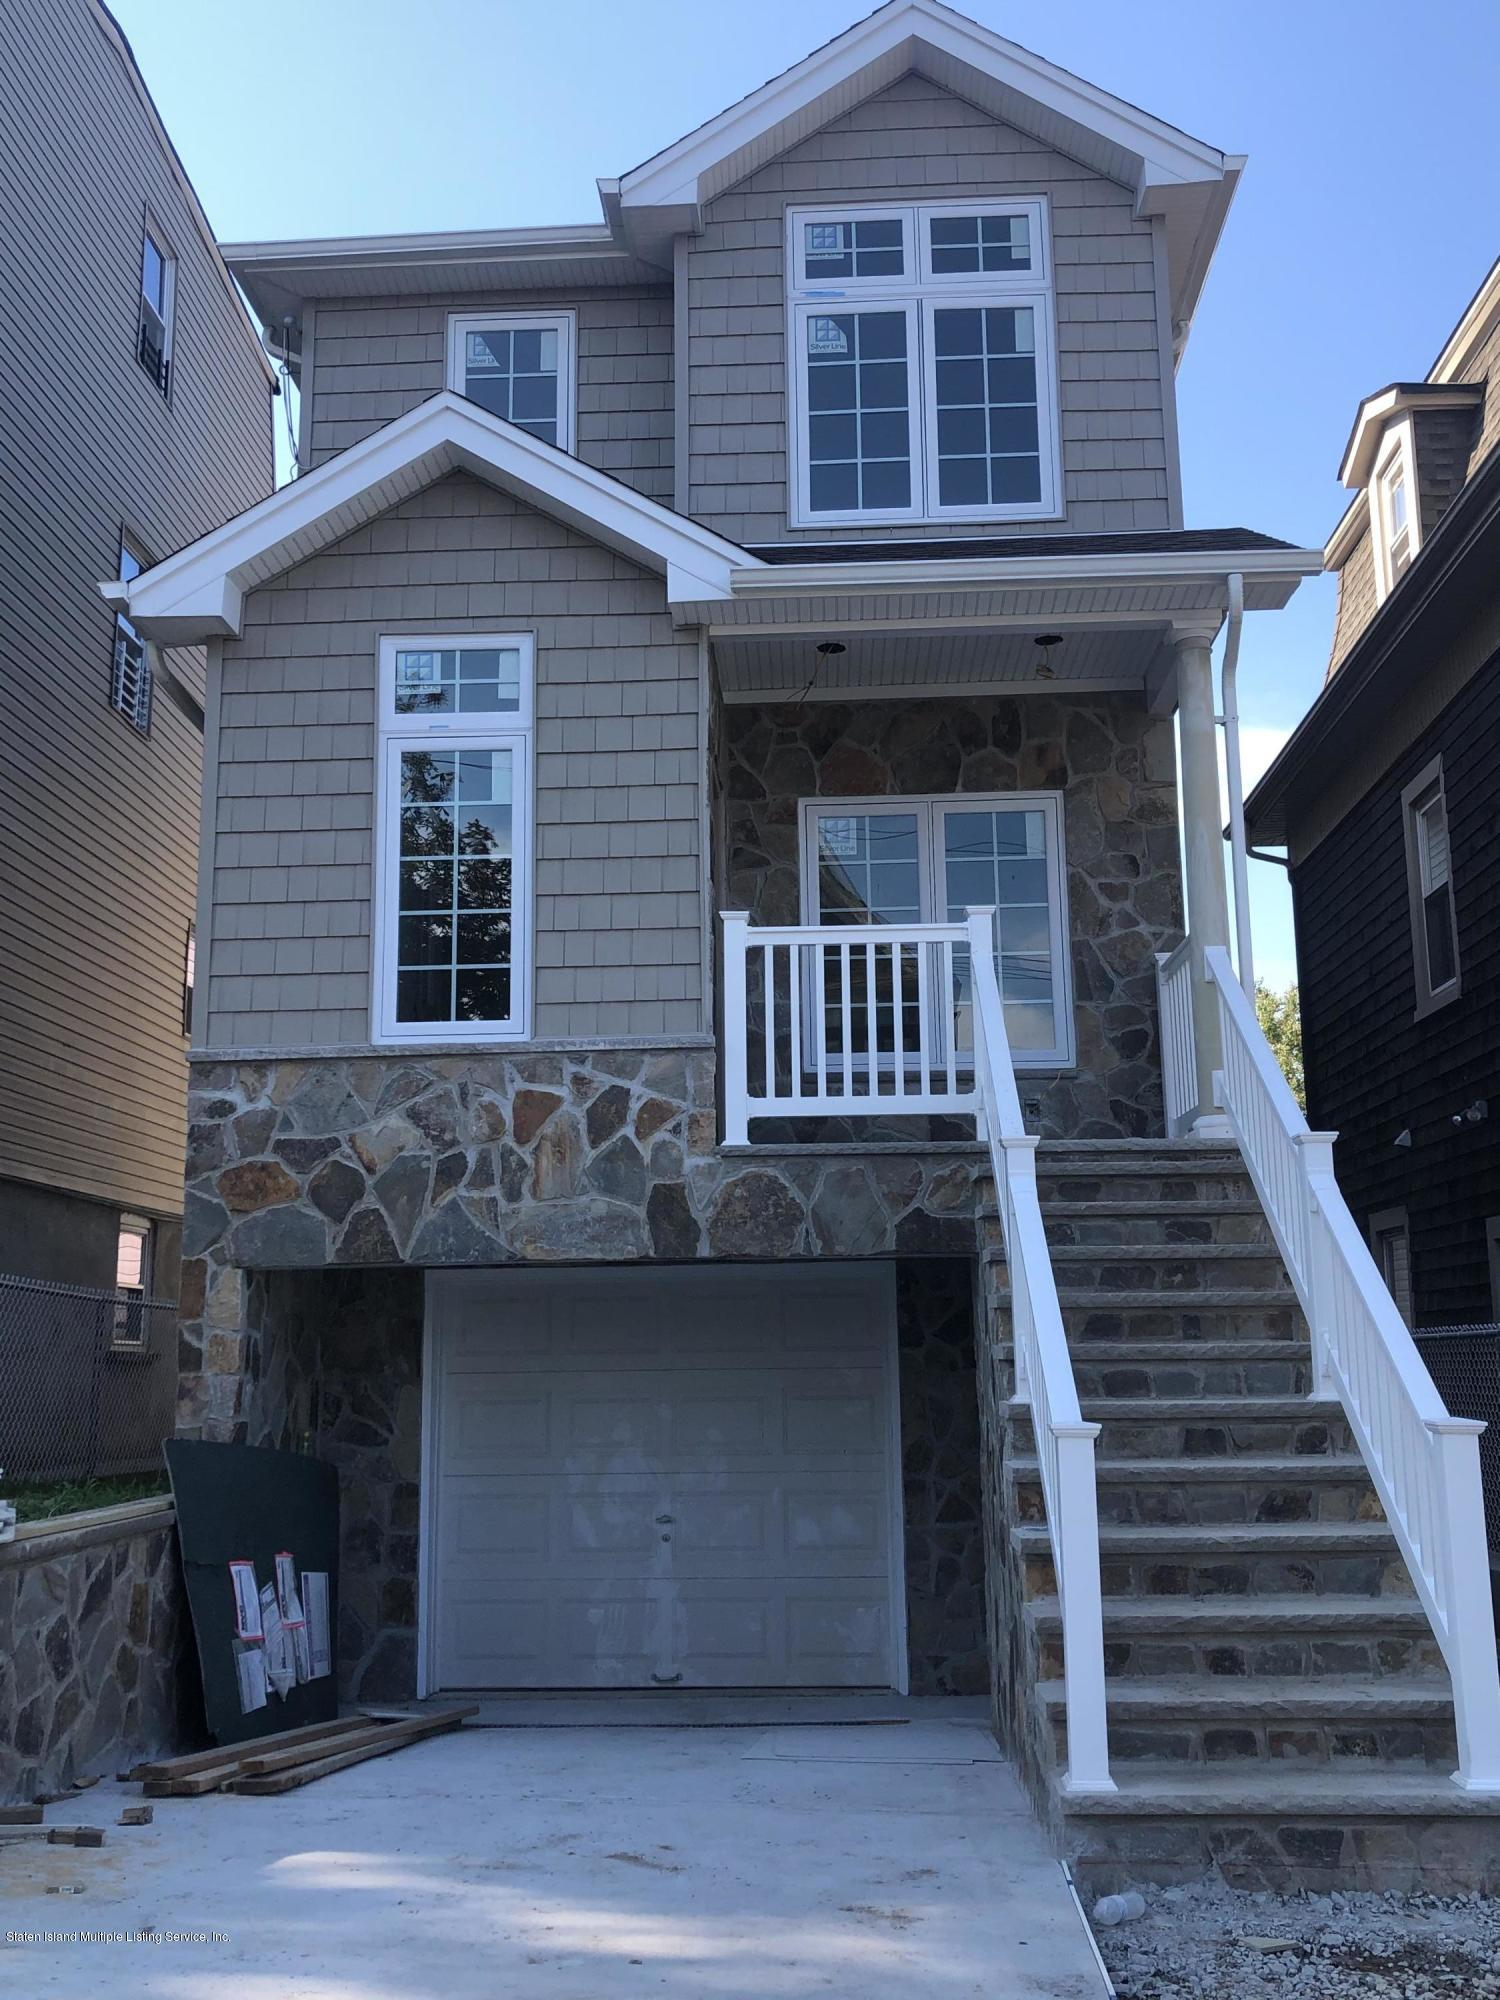 Single Family - Detached 36 Scribner Avenue  Staten Island, NY 10301, MLS-1128108-11